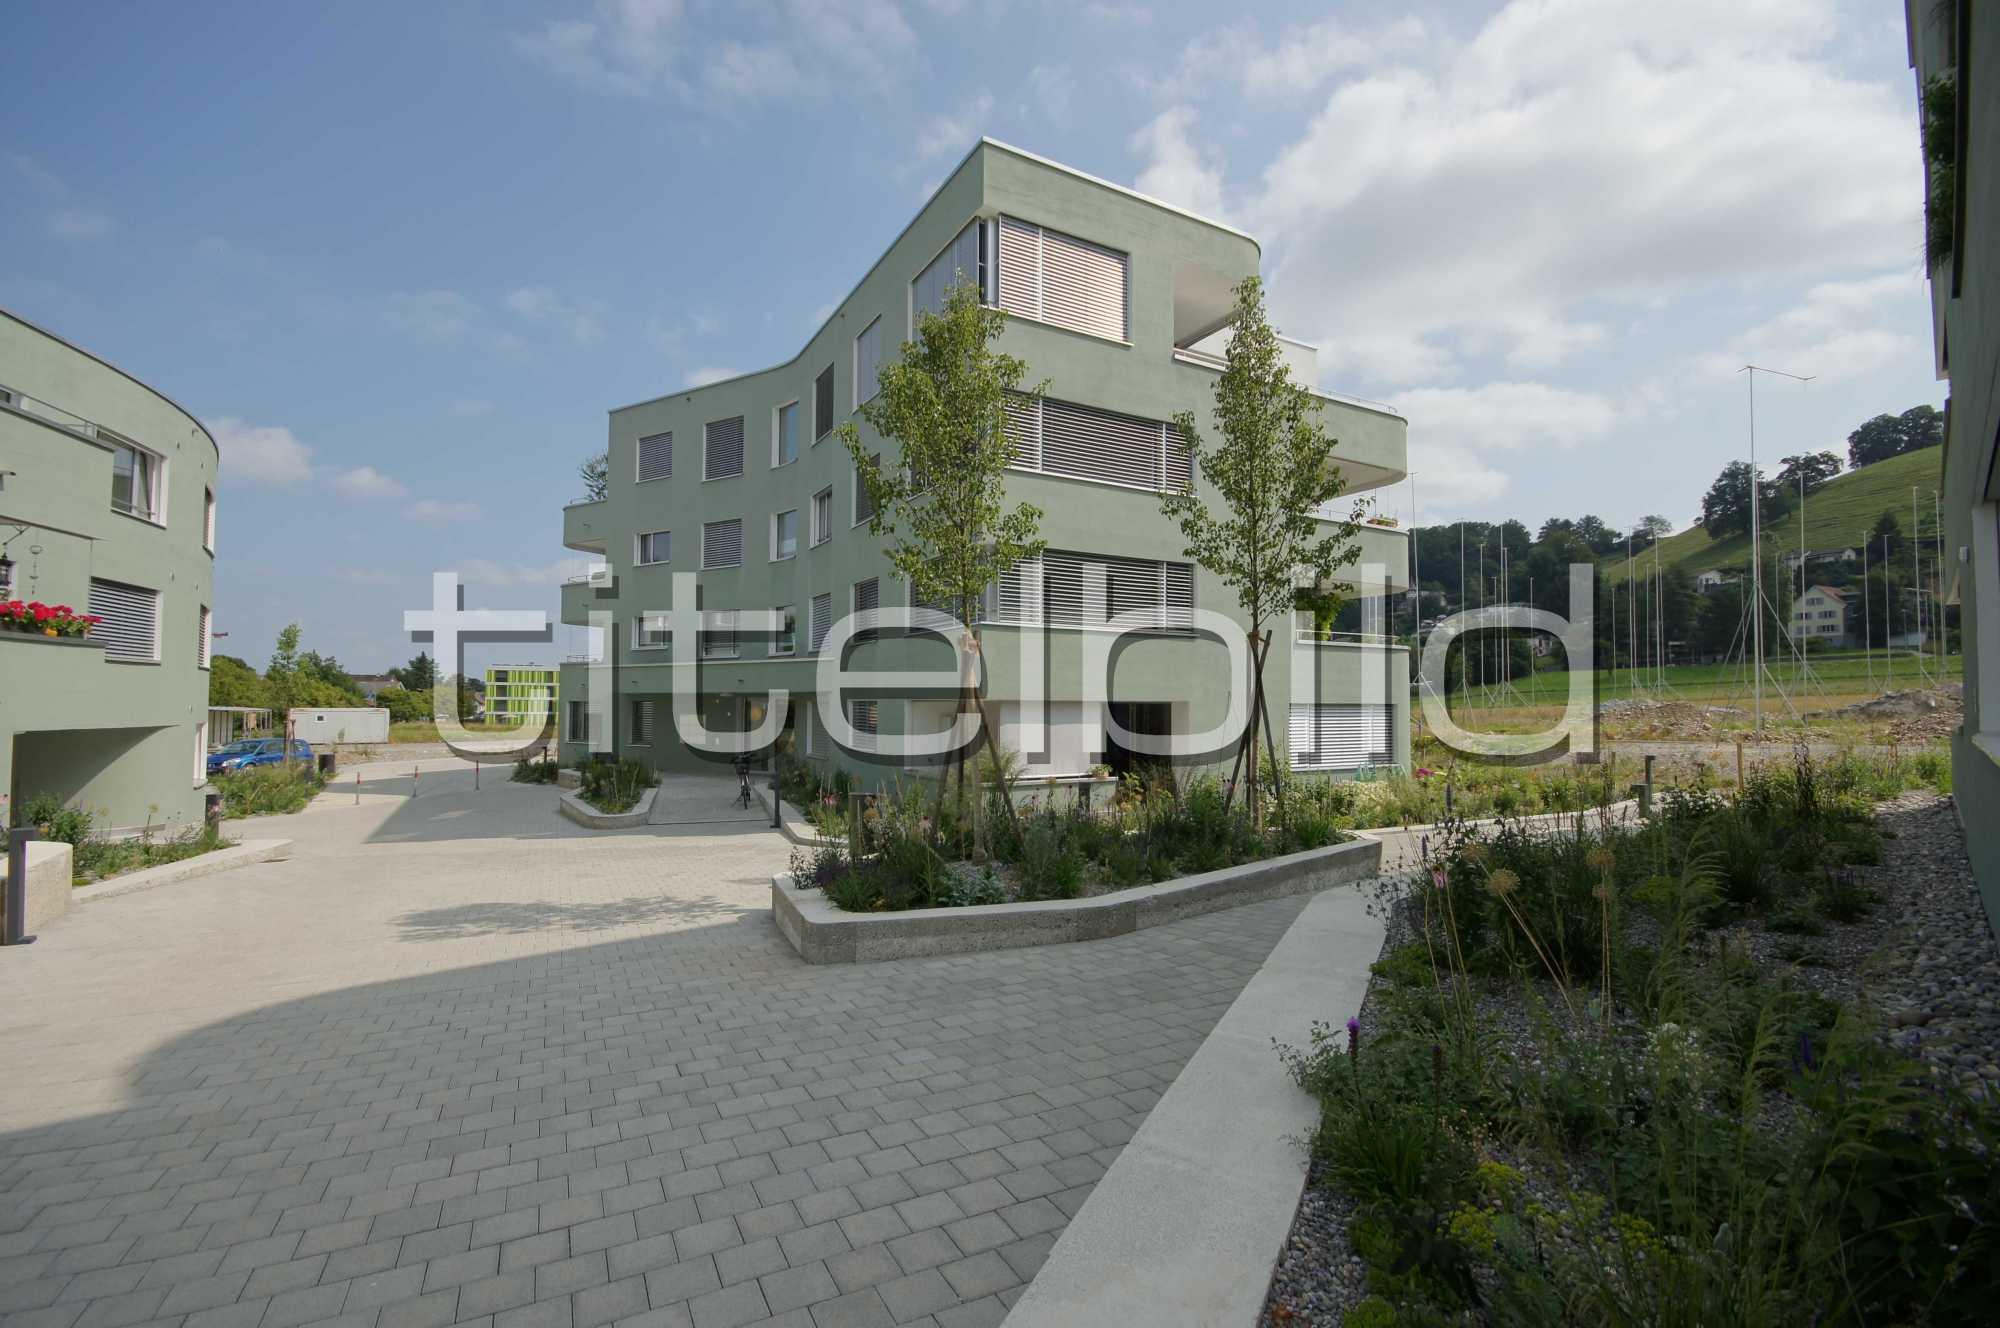 Projektbild-Nr. 6: Wohnüberbauung Widmi 3